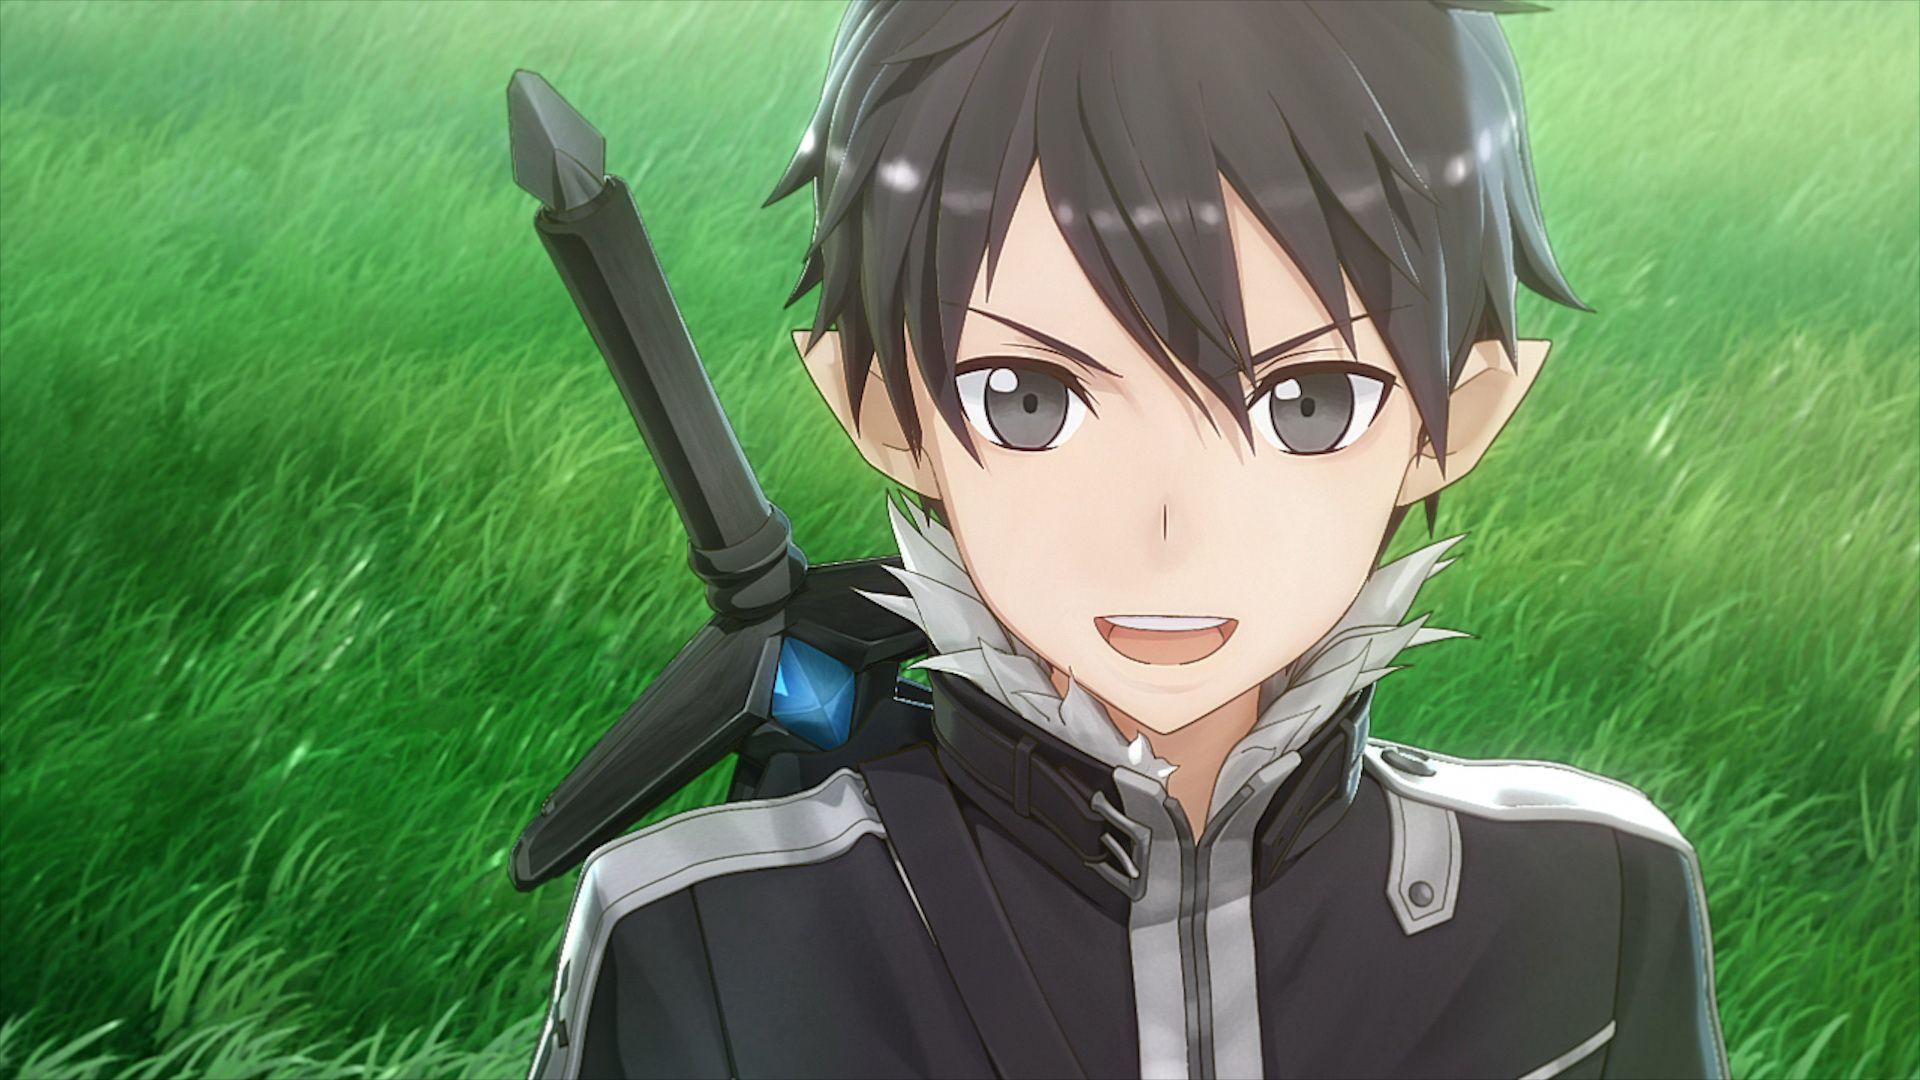 Sword Art Online Lost Song arrive bientôt en France sur